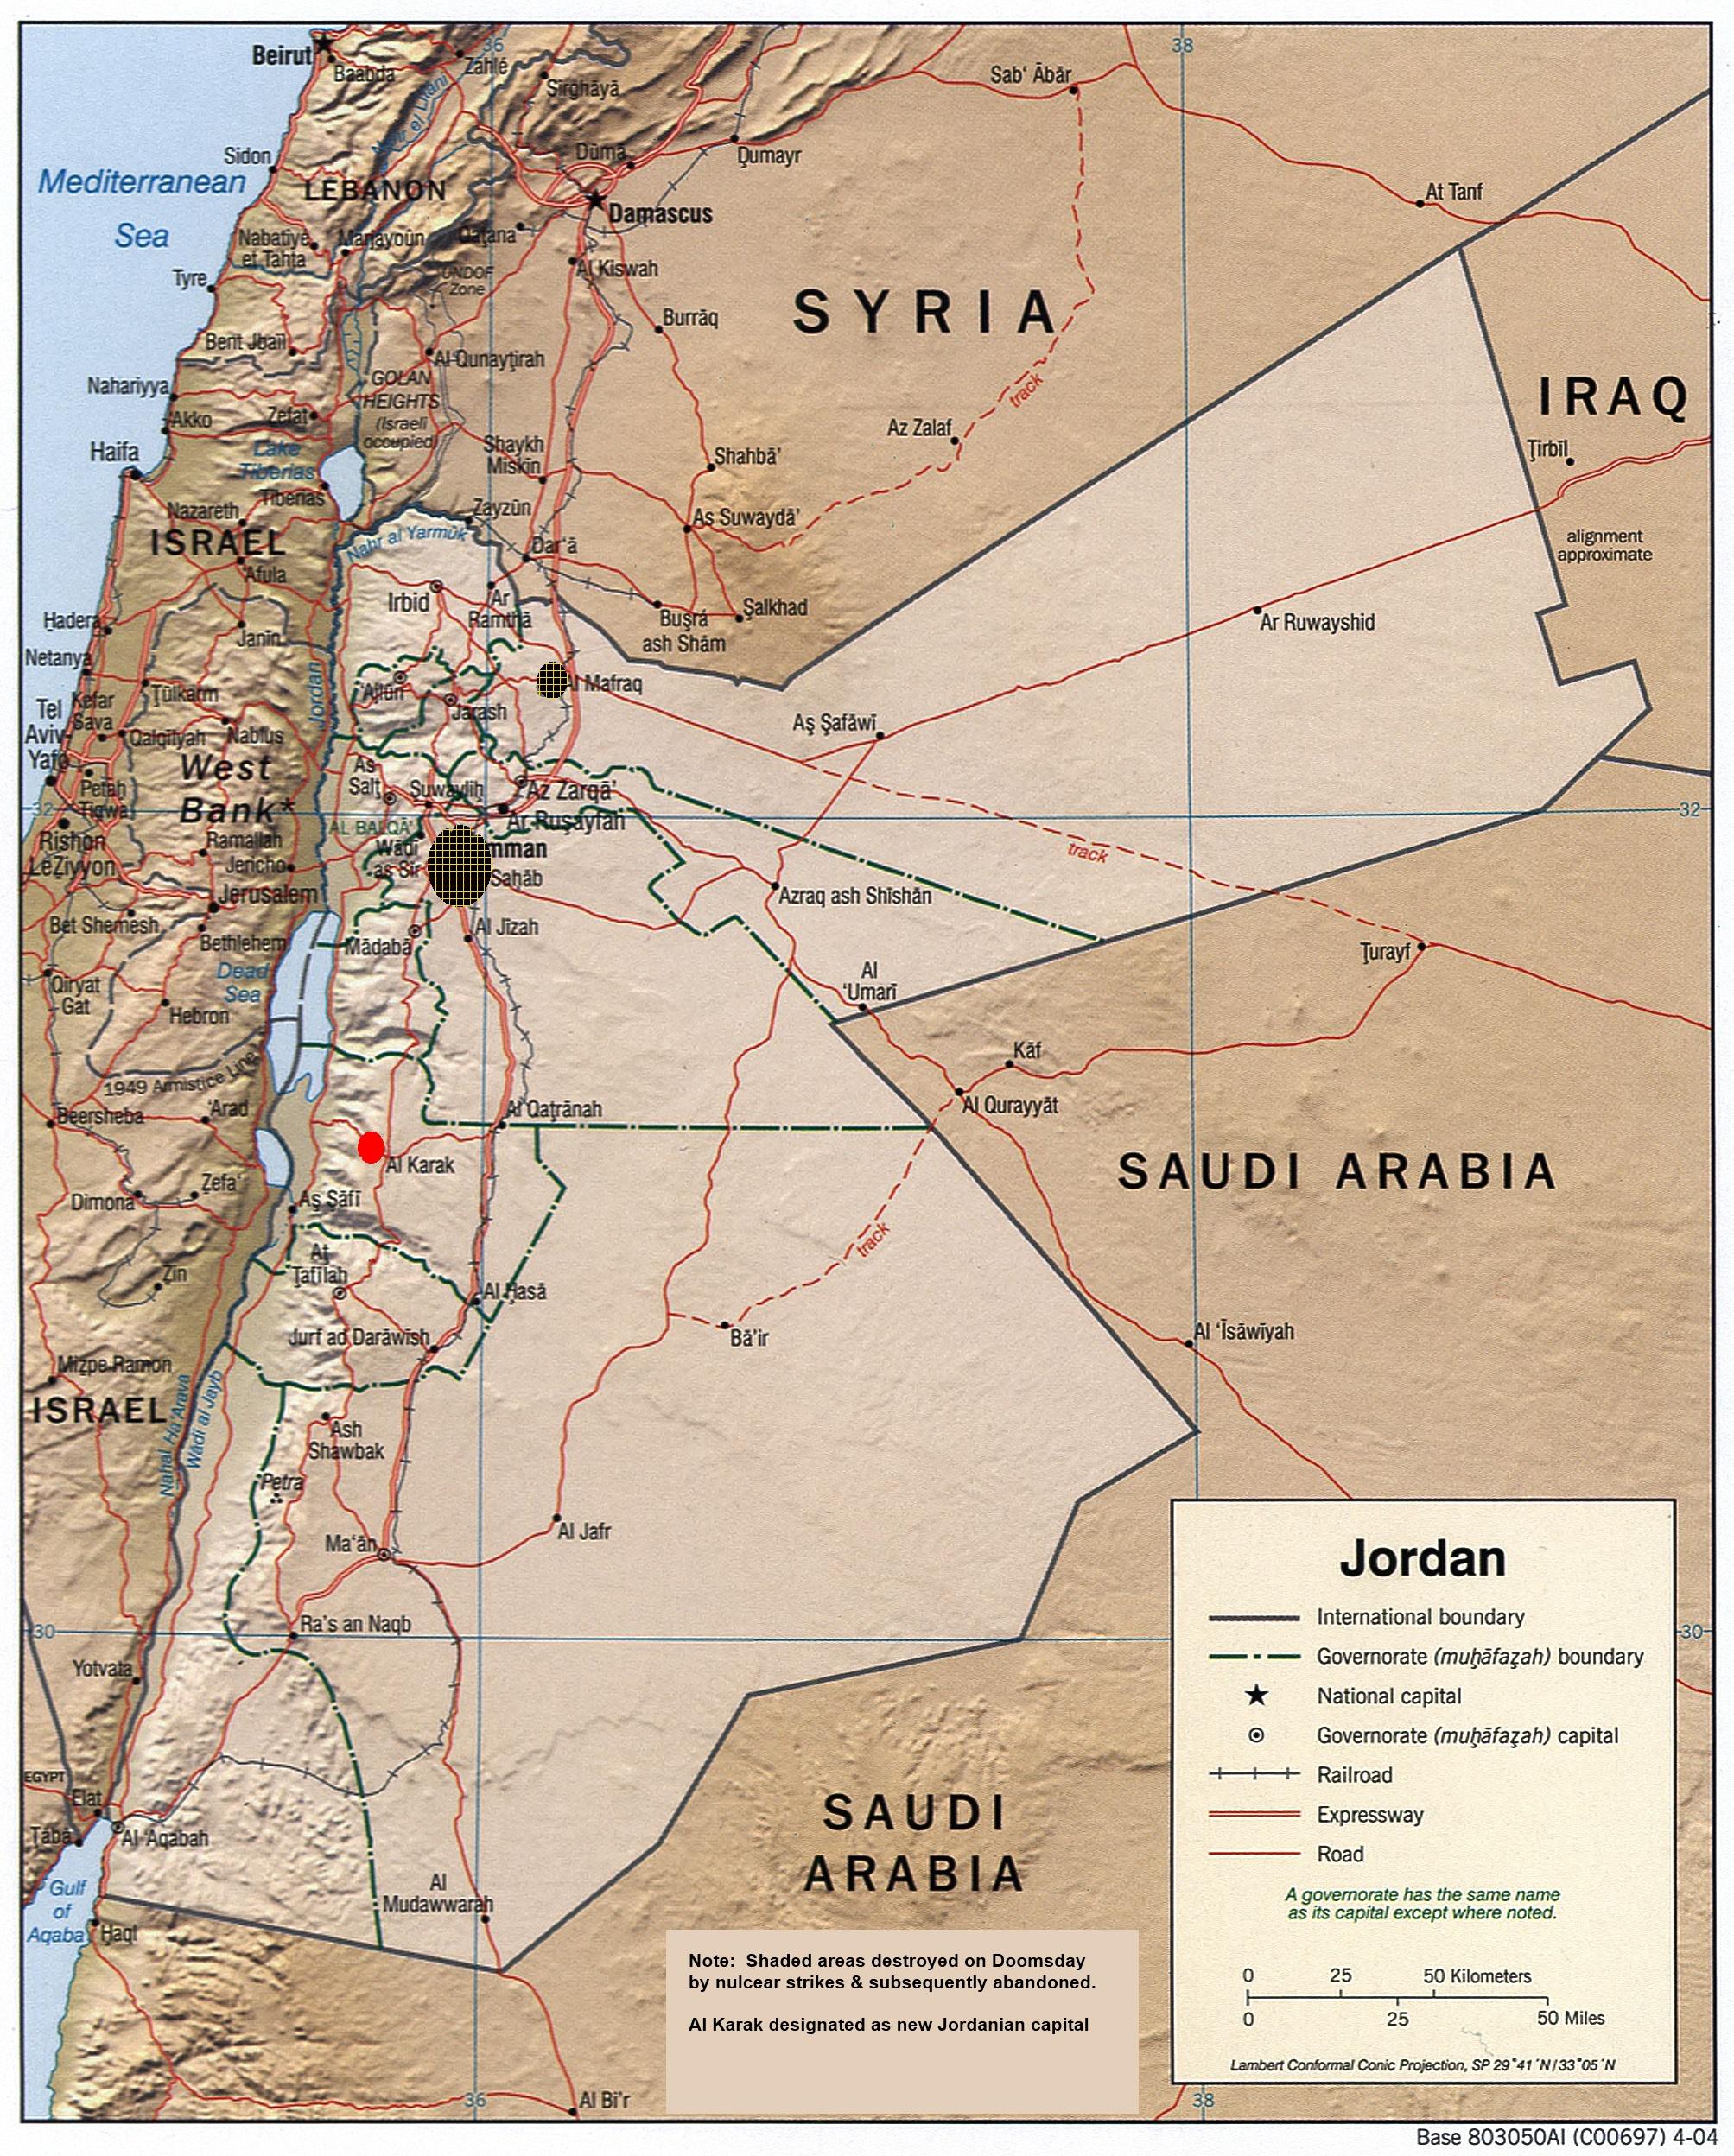 az zarqa chatrooms Jordan al-aqabah, al-quwaysimah, amman, ar-rusayfah, az-zarqa, irbid, khuraybat as-suq, tila al-ali, wadi as-sir gifts & flowers.